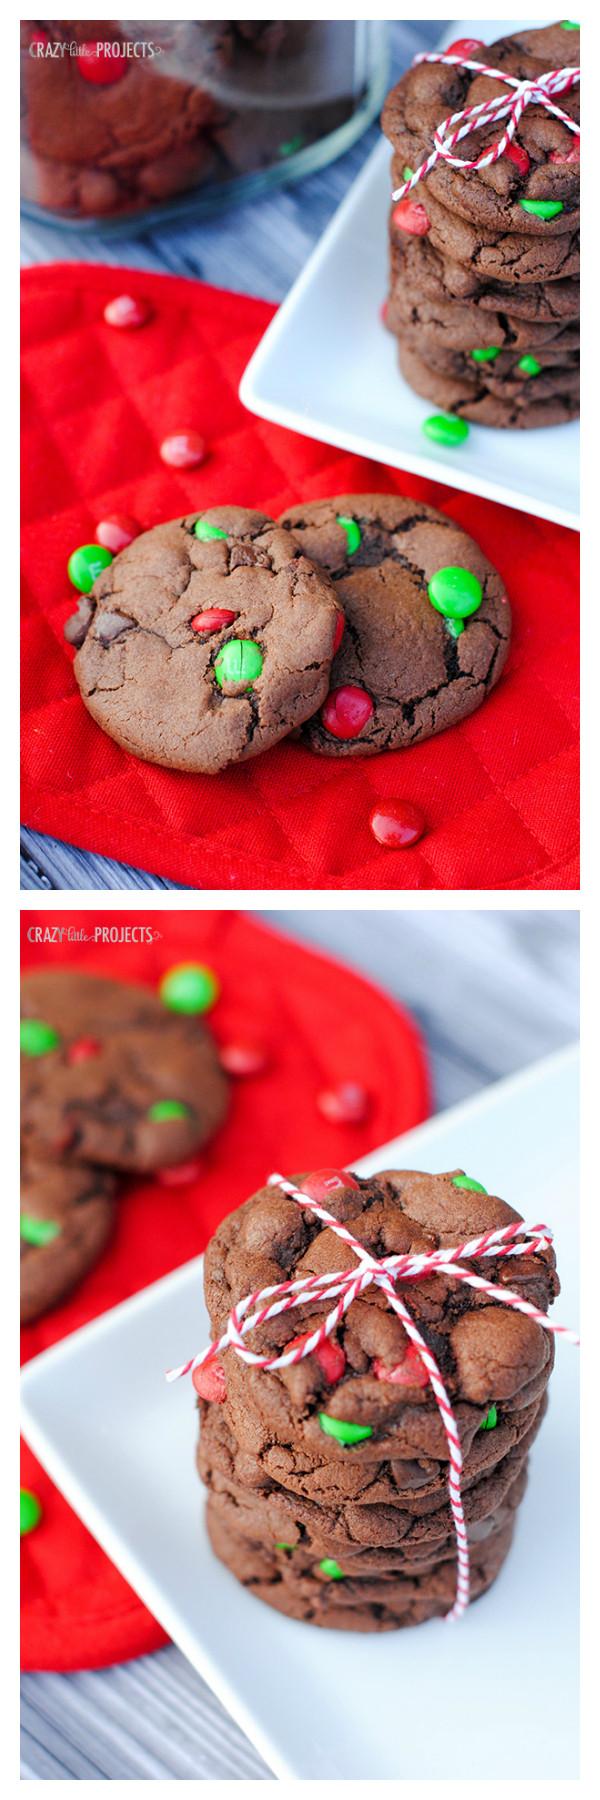 Chocolate Mint Christmas Cookies  Double Chocolate Mint Cookies for Christmas Crazy Little